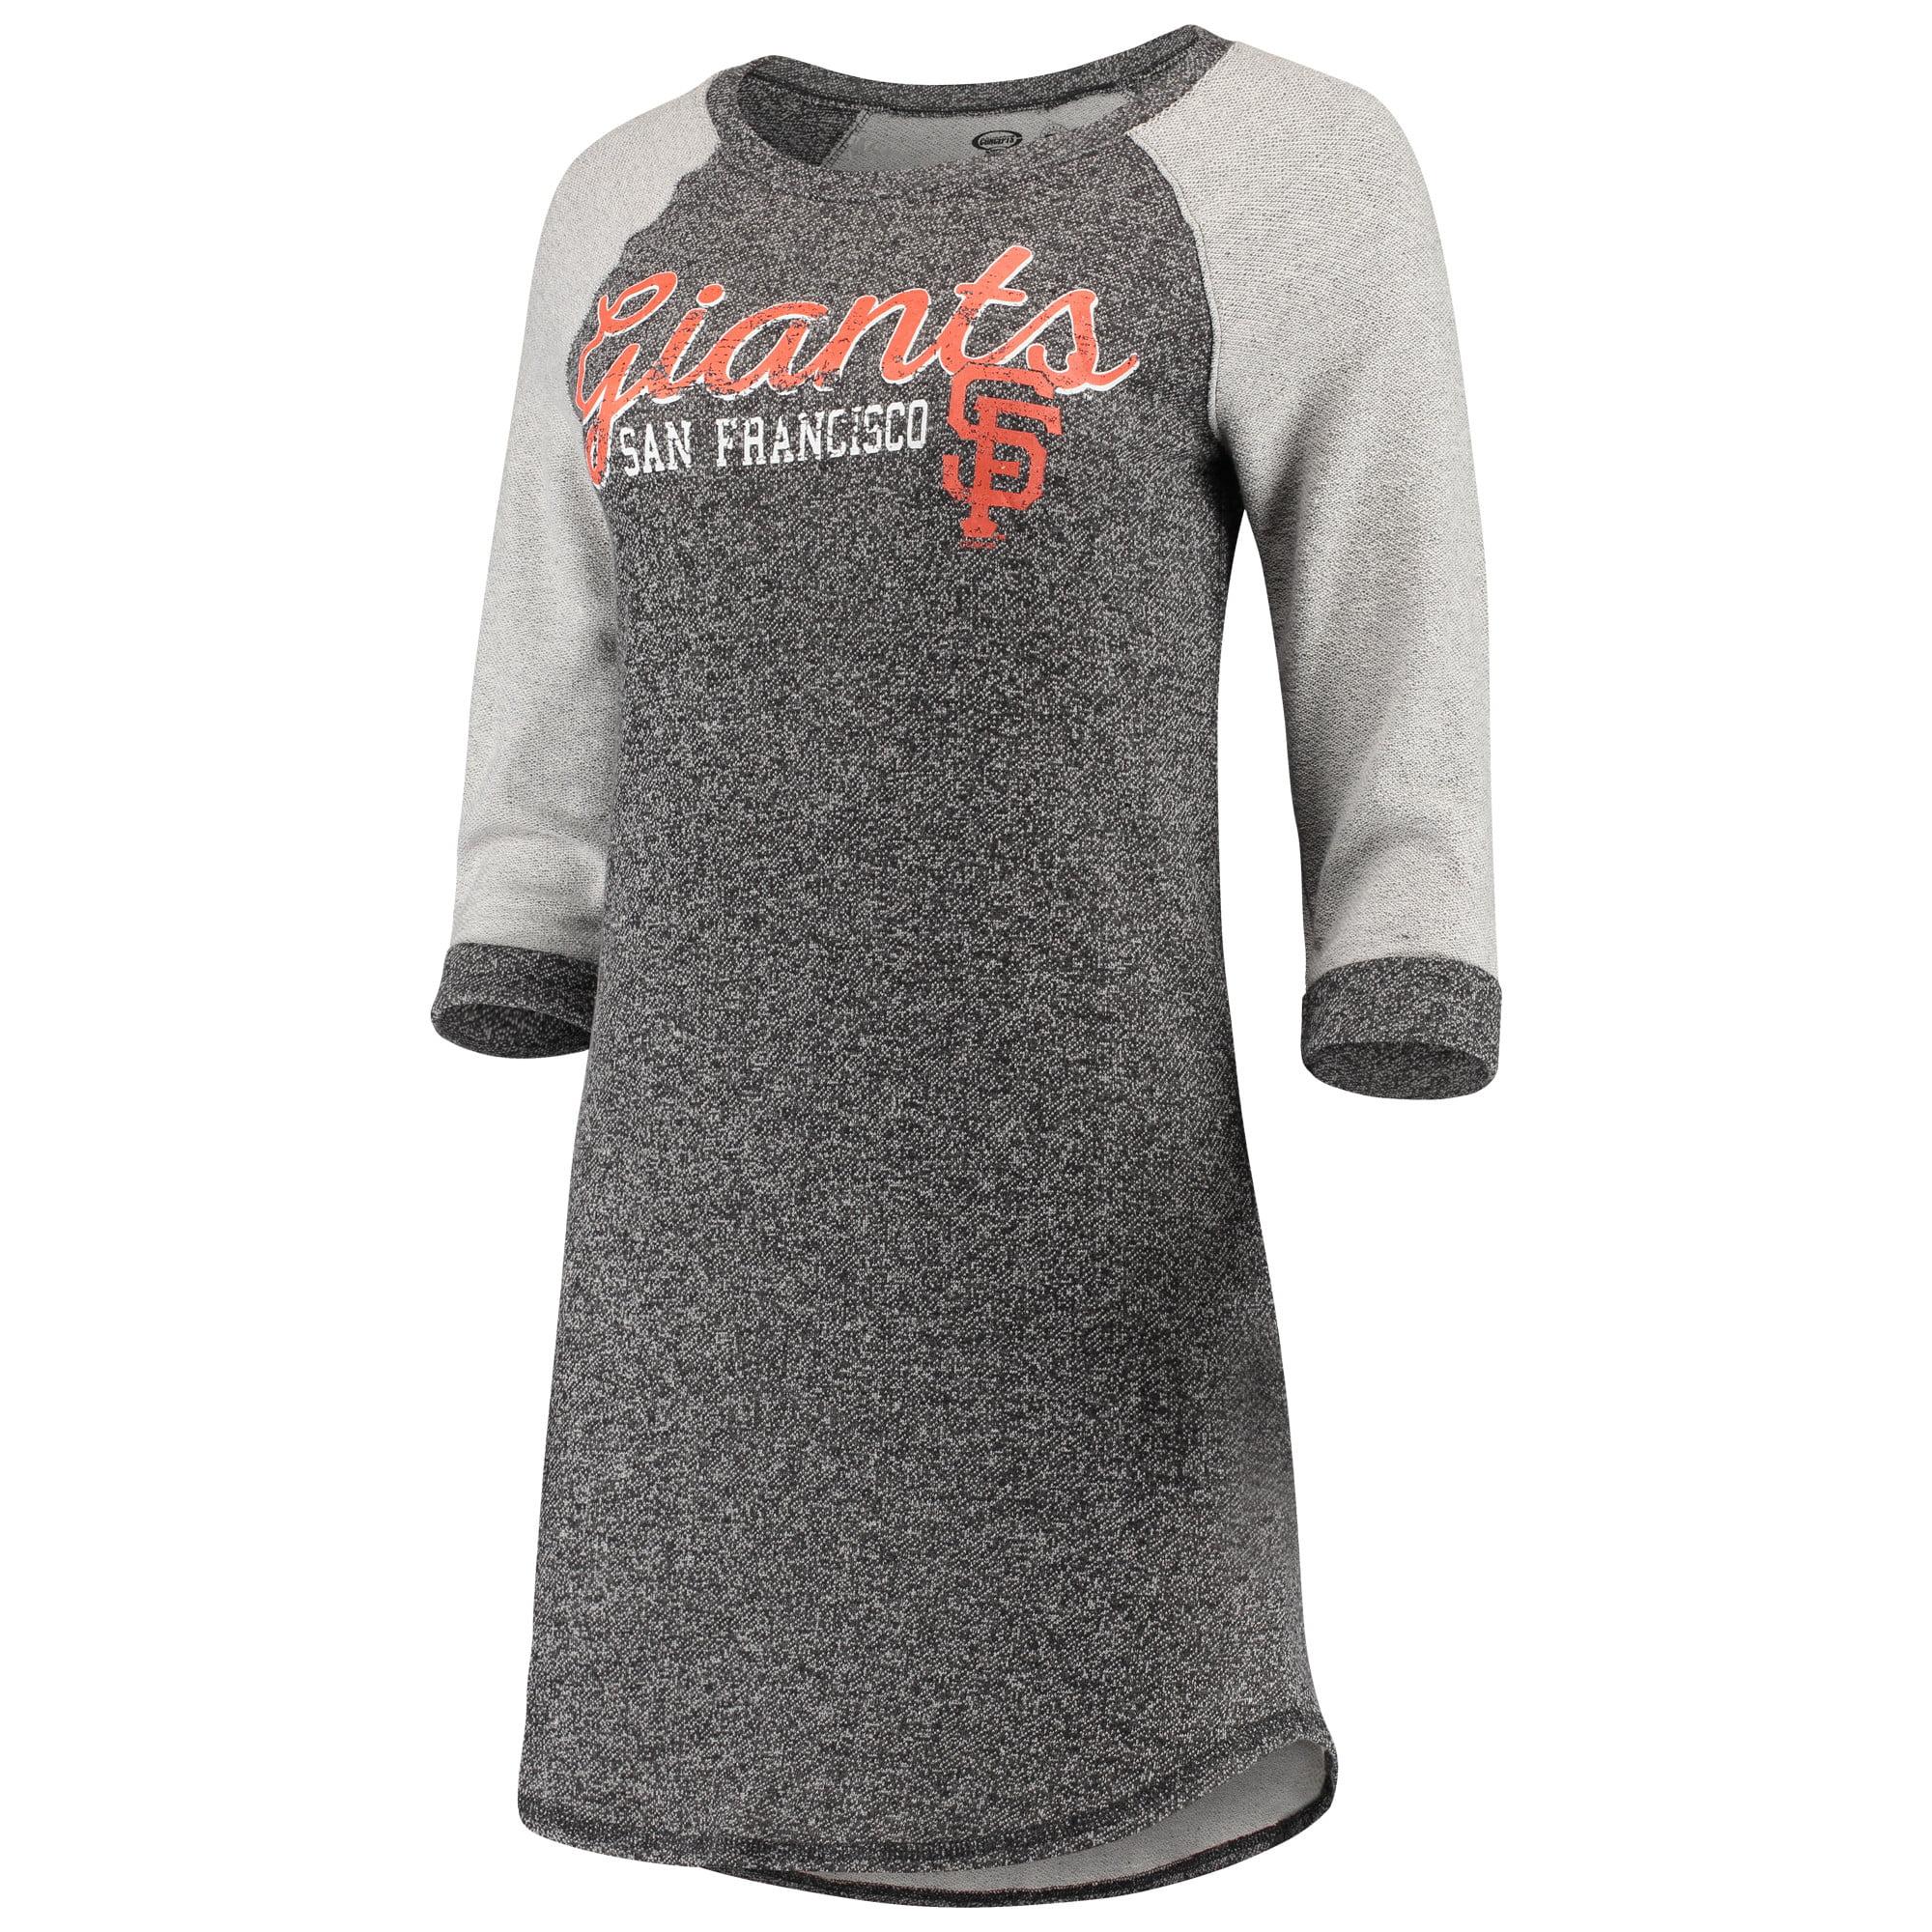 San Francisco Giants Concepts Sport Women's Walk-Off 3/4-Sleeve Nightshirt - Charcoal